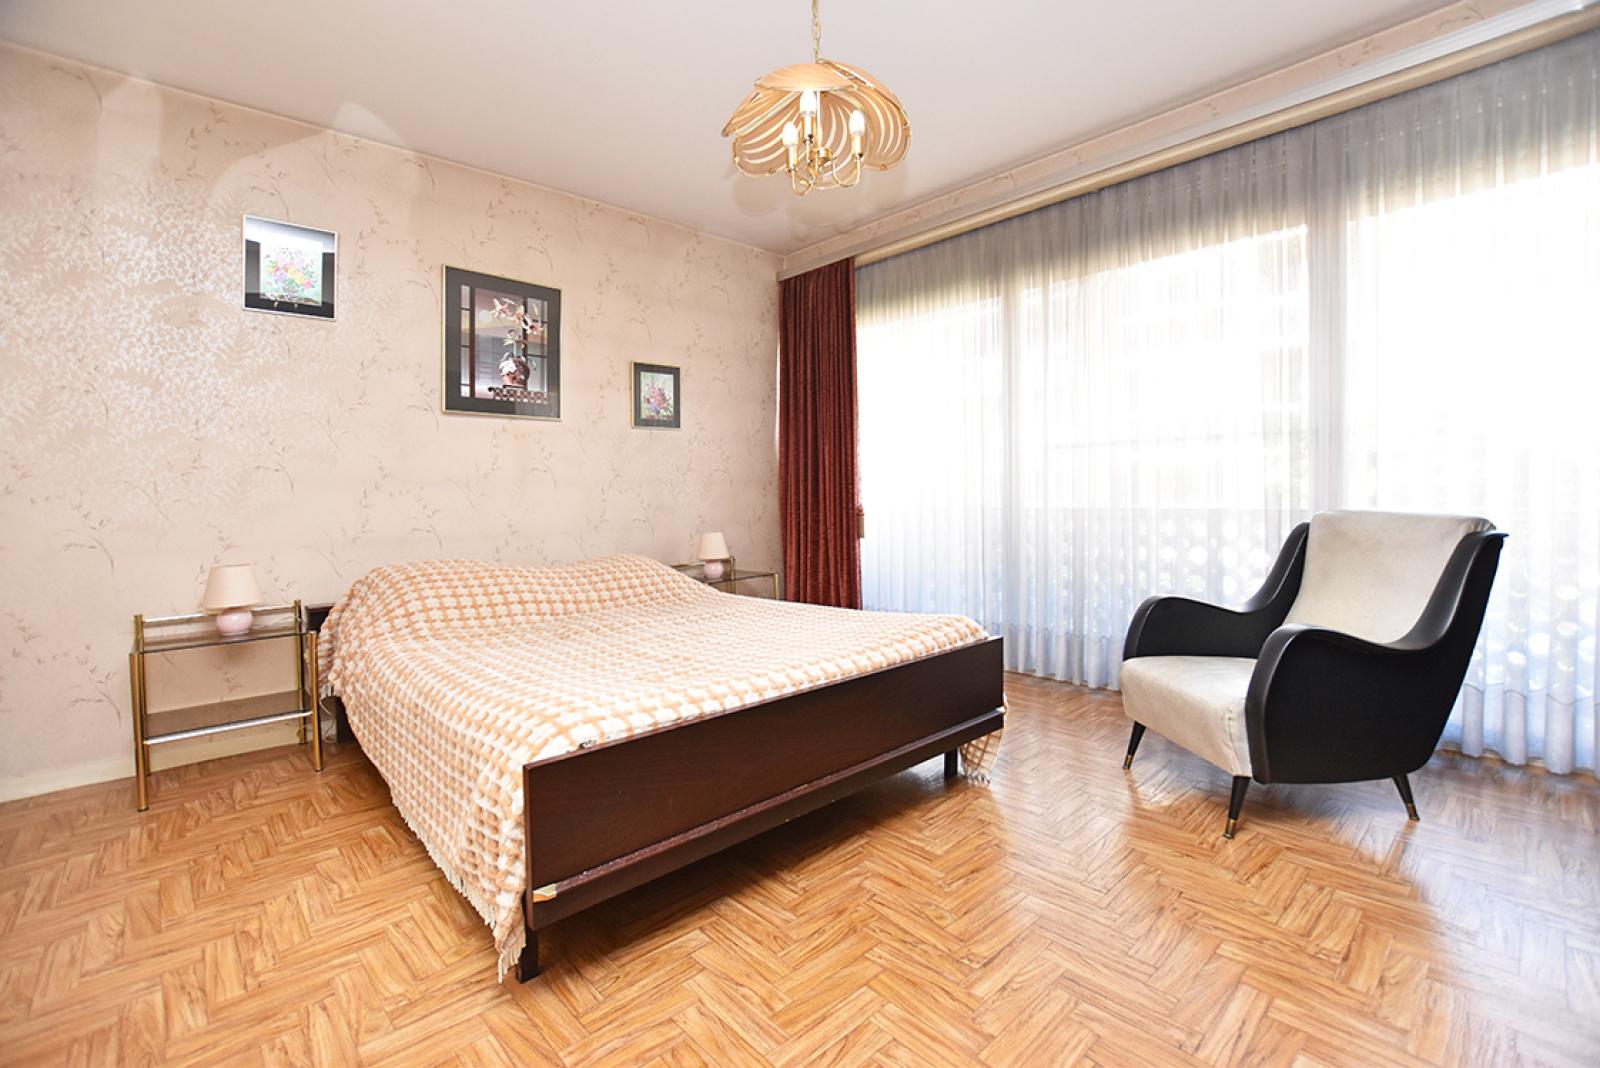 Te renoveren appartement met twee slaapkamers in een rustige straat te Deurne!  afbeelding 7